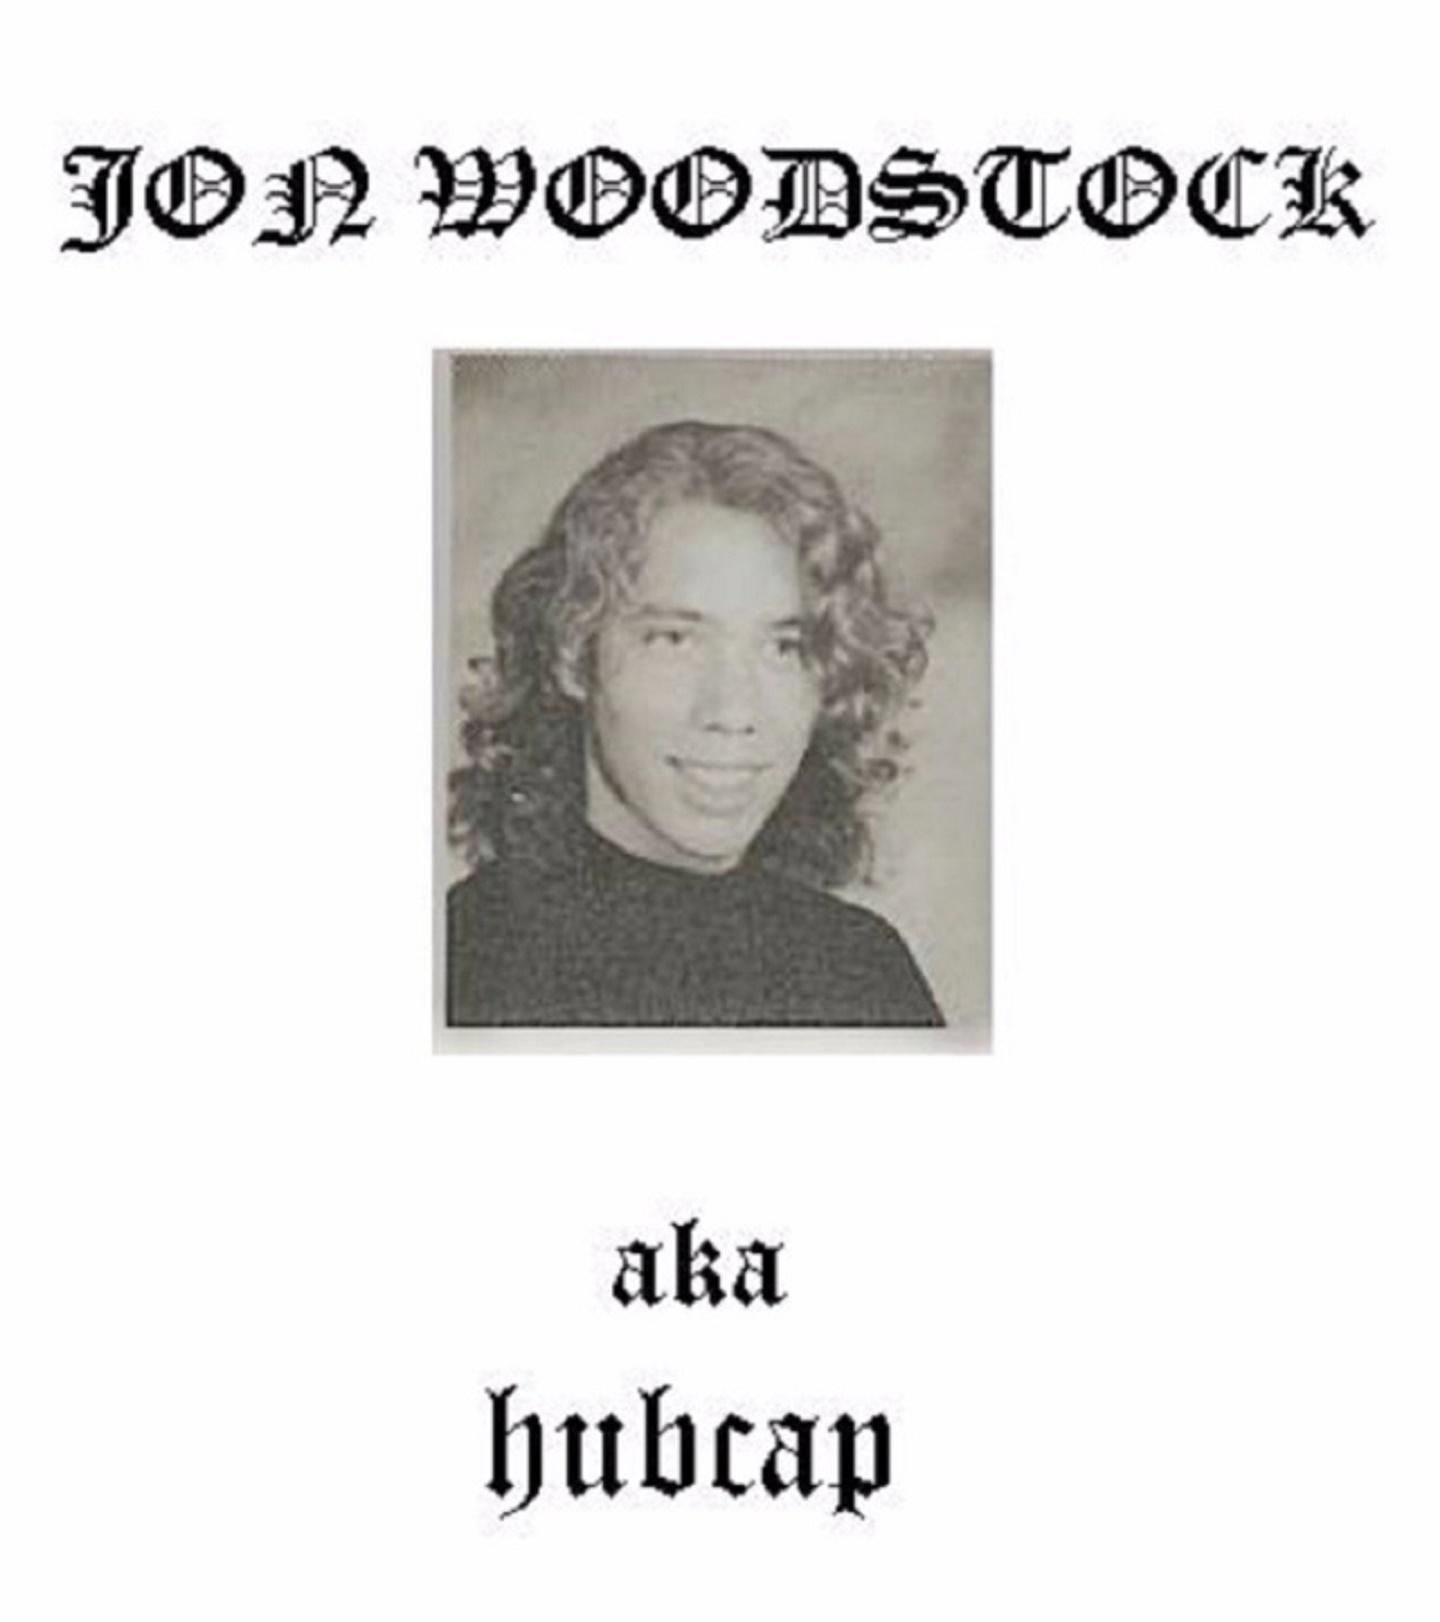 XTRA BIG jon-woodstock-album-cover